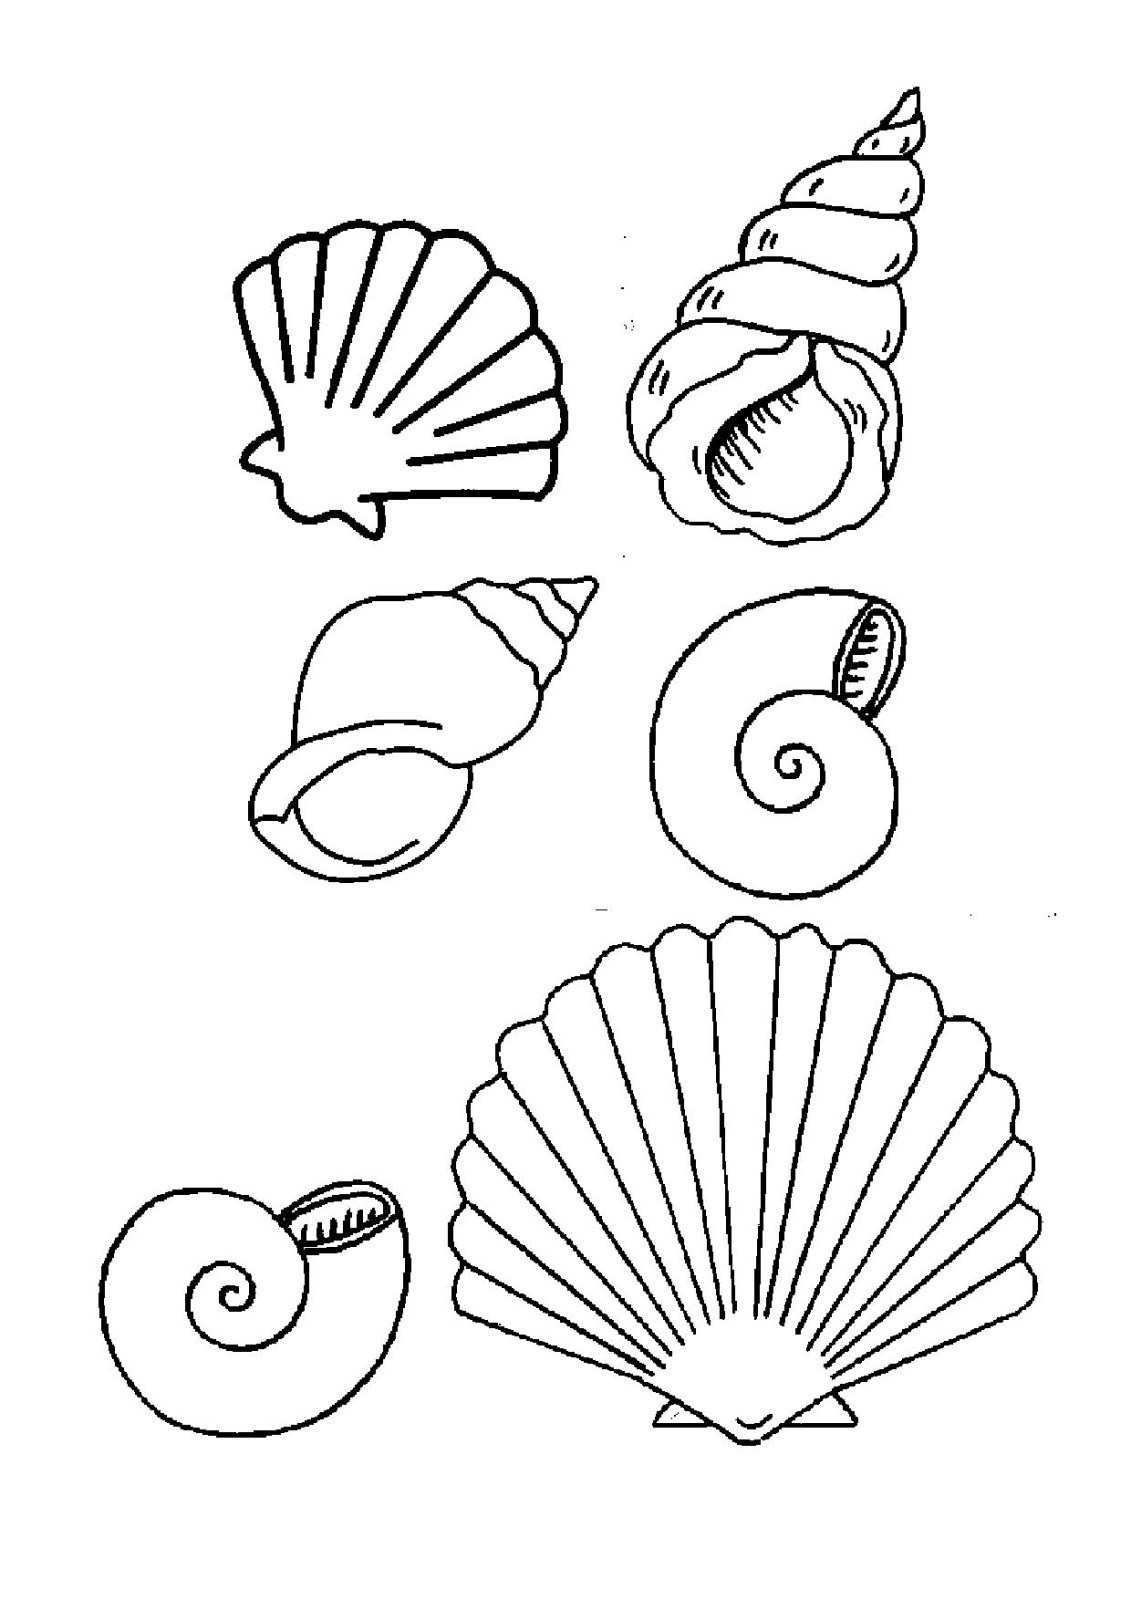 19 Dessins De Coloriage Coquillage De Mer A Imprimer 4421 Coloriage De Poissons De Mer In 2020 Starfish Drawing Drawings Easy Drawings